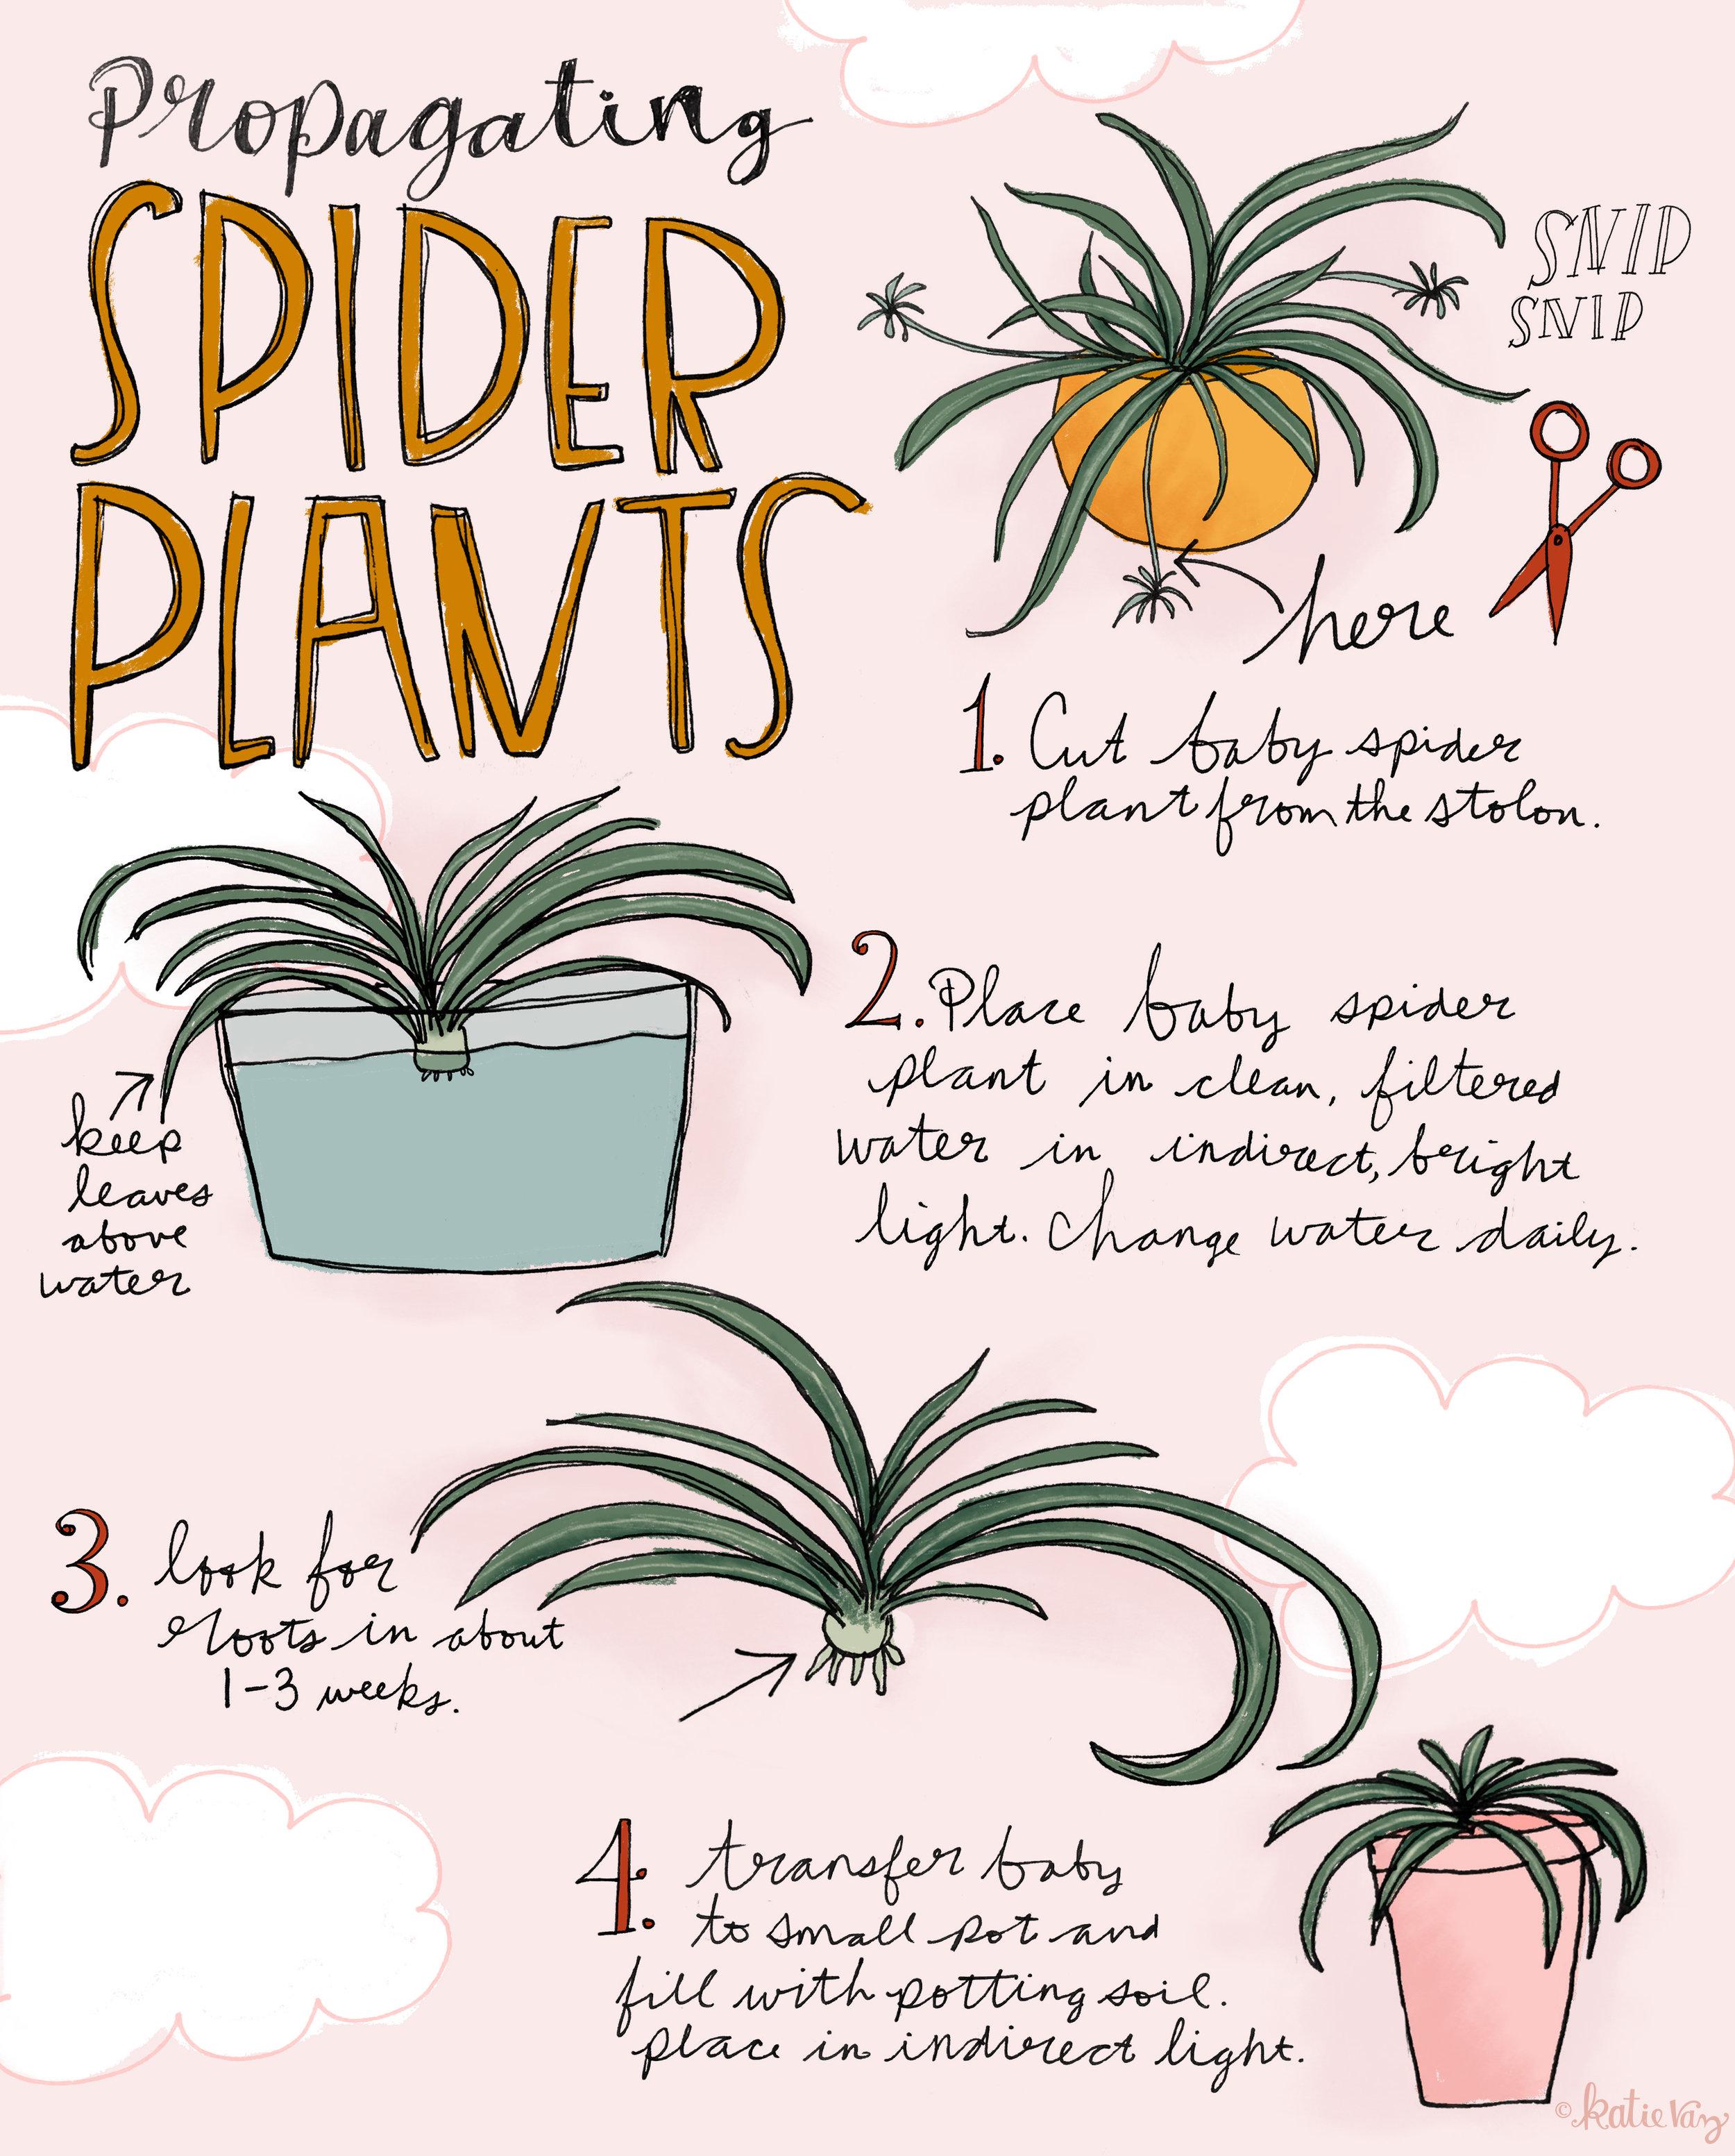 Propagating Spider Plants Katie Vaz